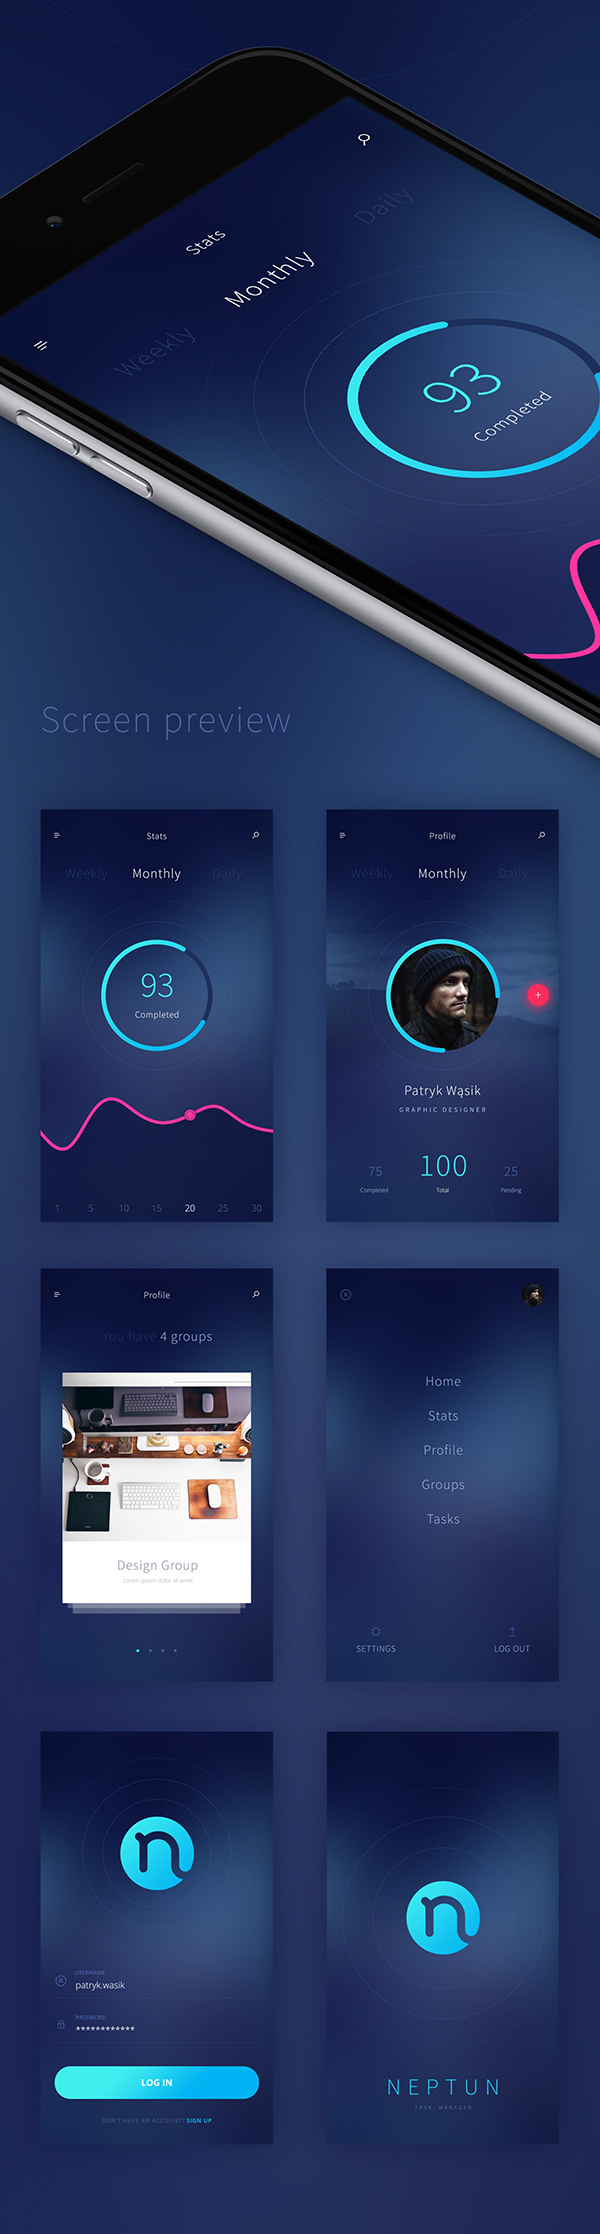 27 Free Neptun Mobile App PSD